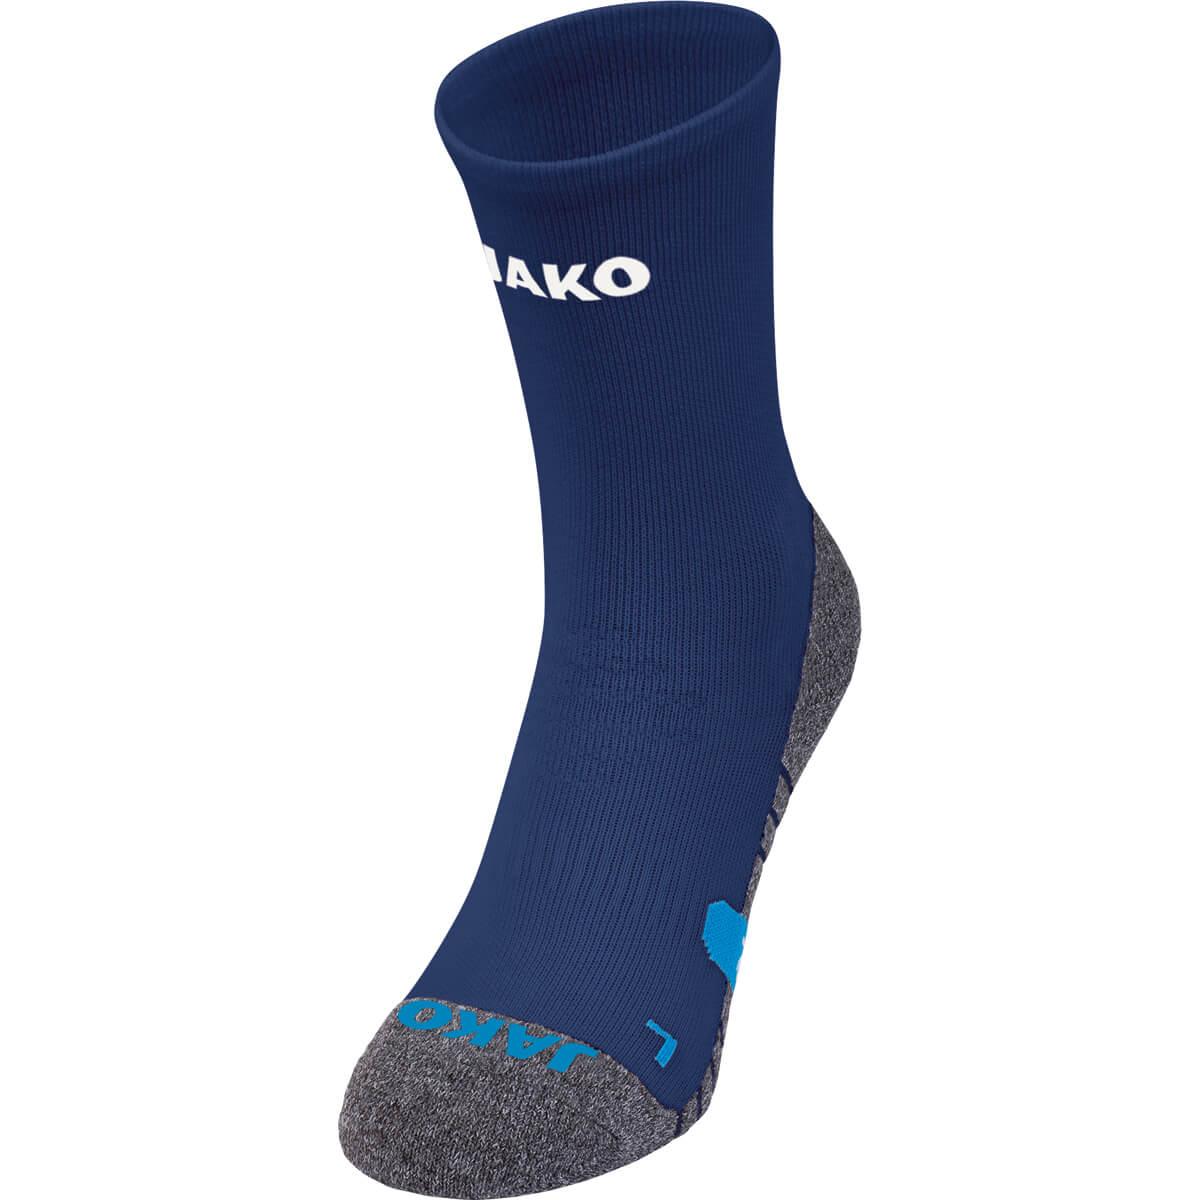 JAKO Training Sports Socks Mens Socks Fitness Socks in 6 Colours 3911